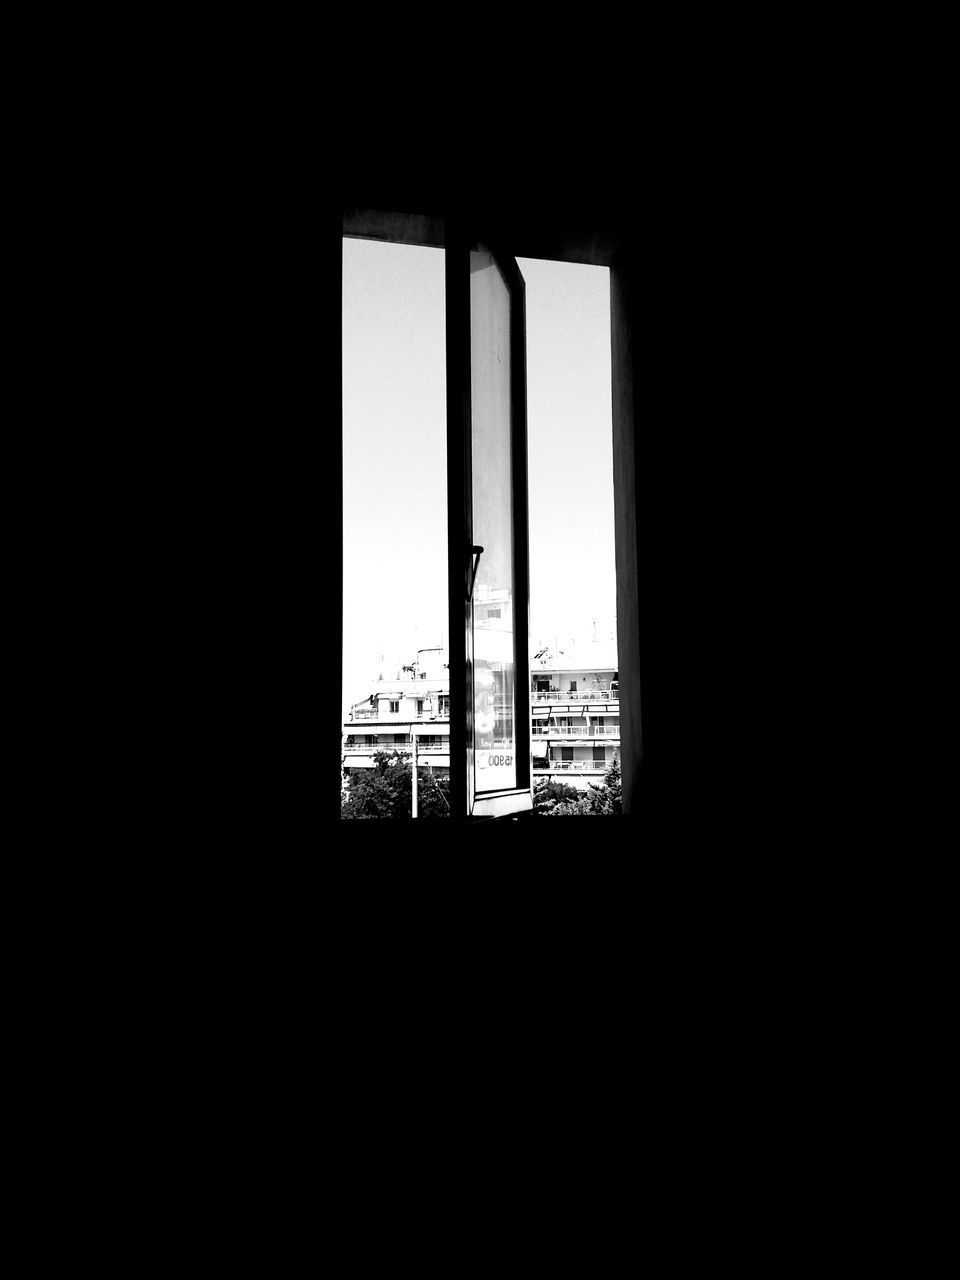 window, indoors, architecture, dark, built structure, no people, day, building exterior, skyscraper, sky